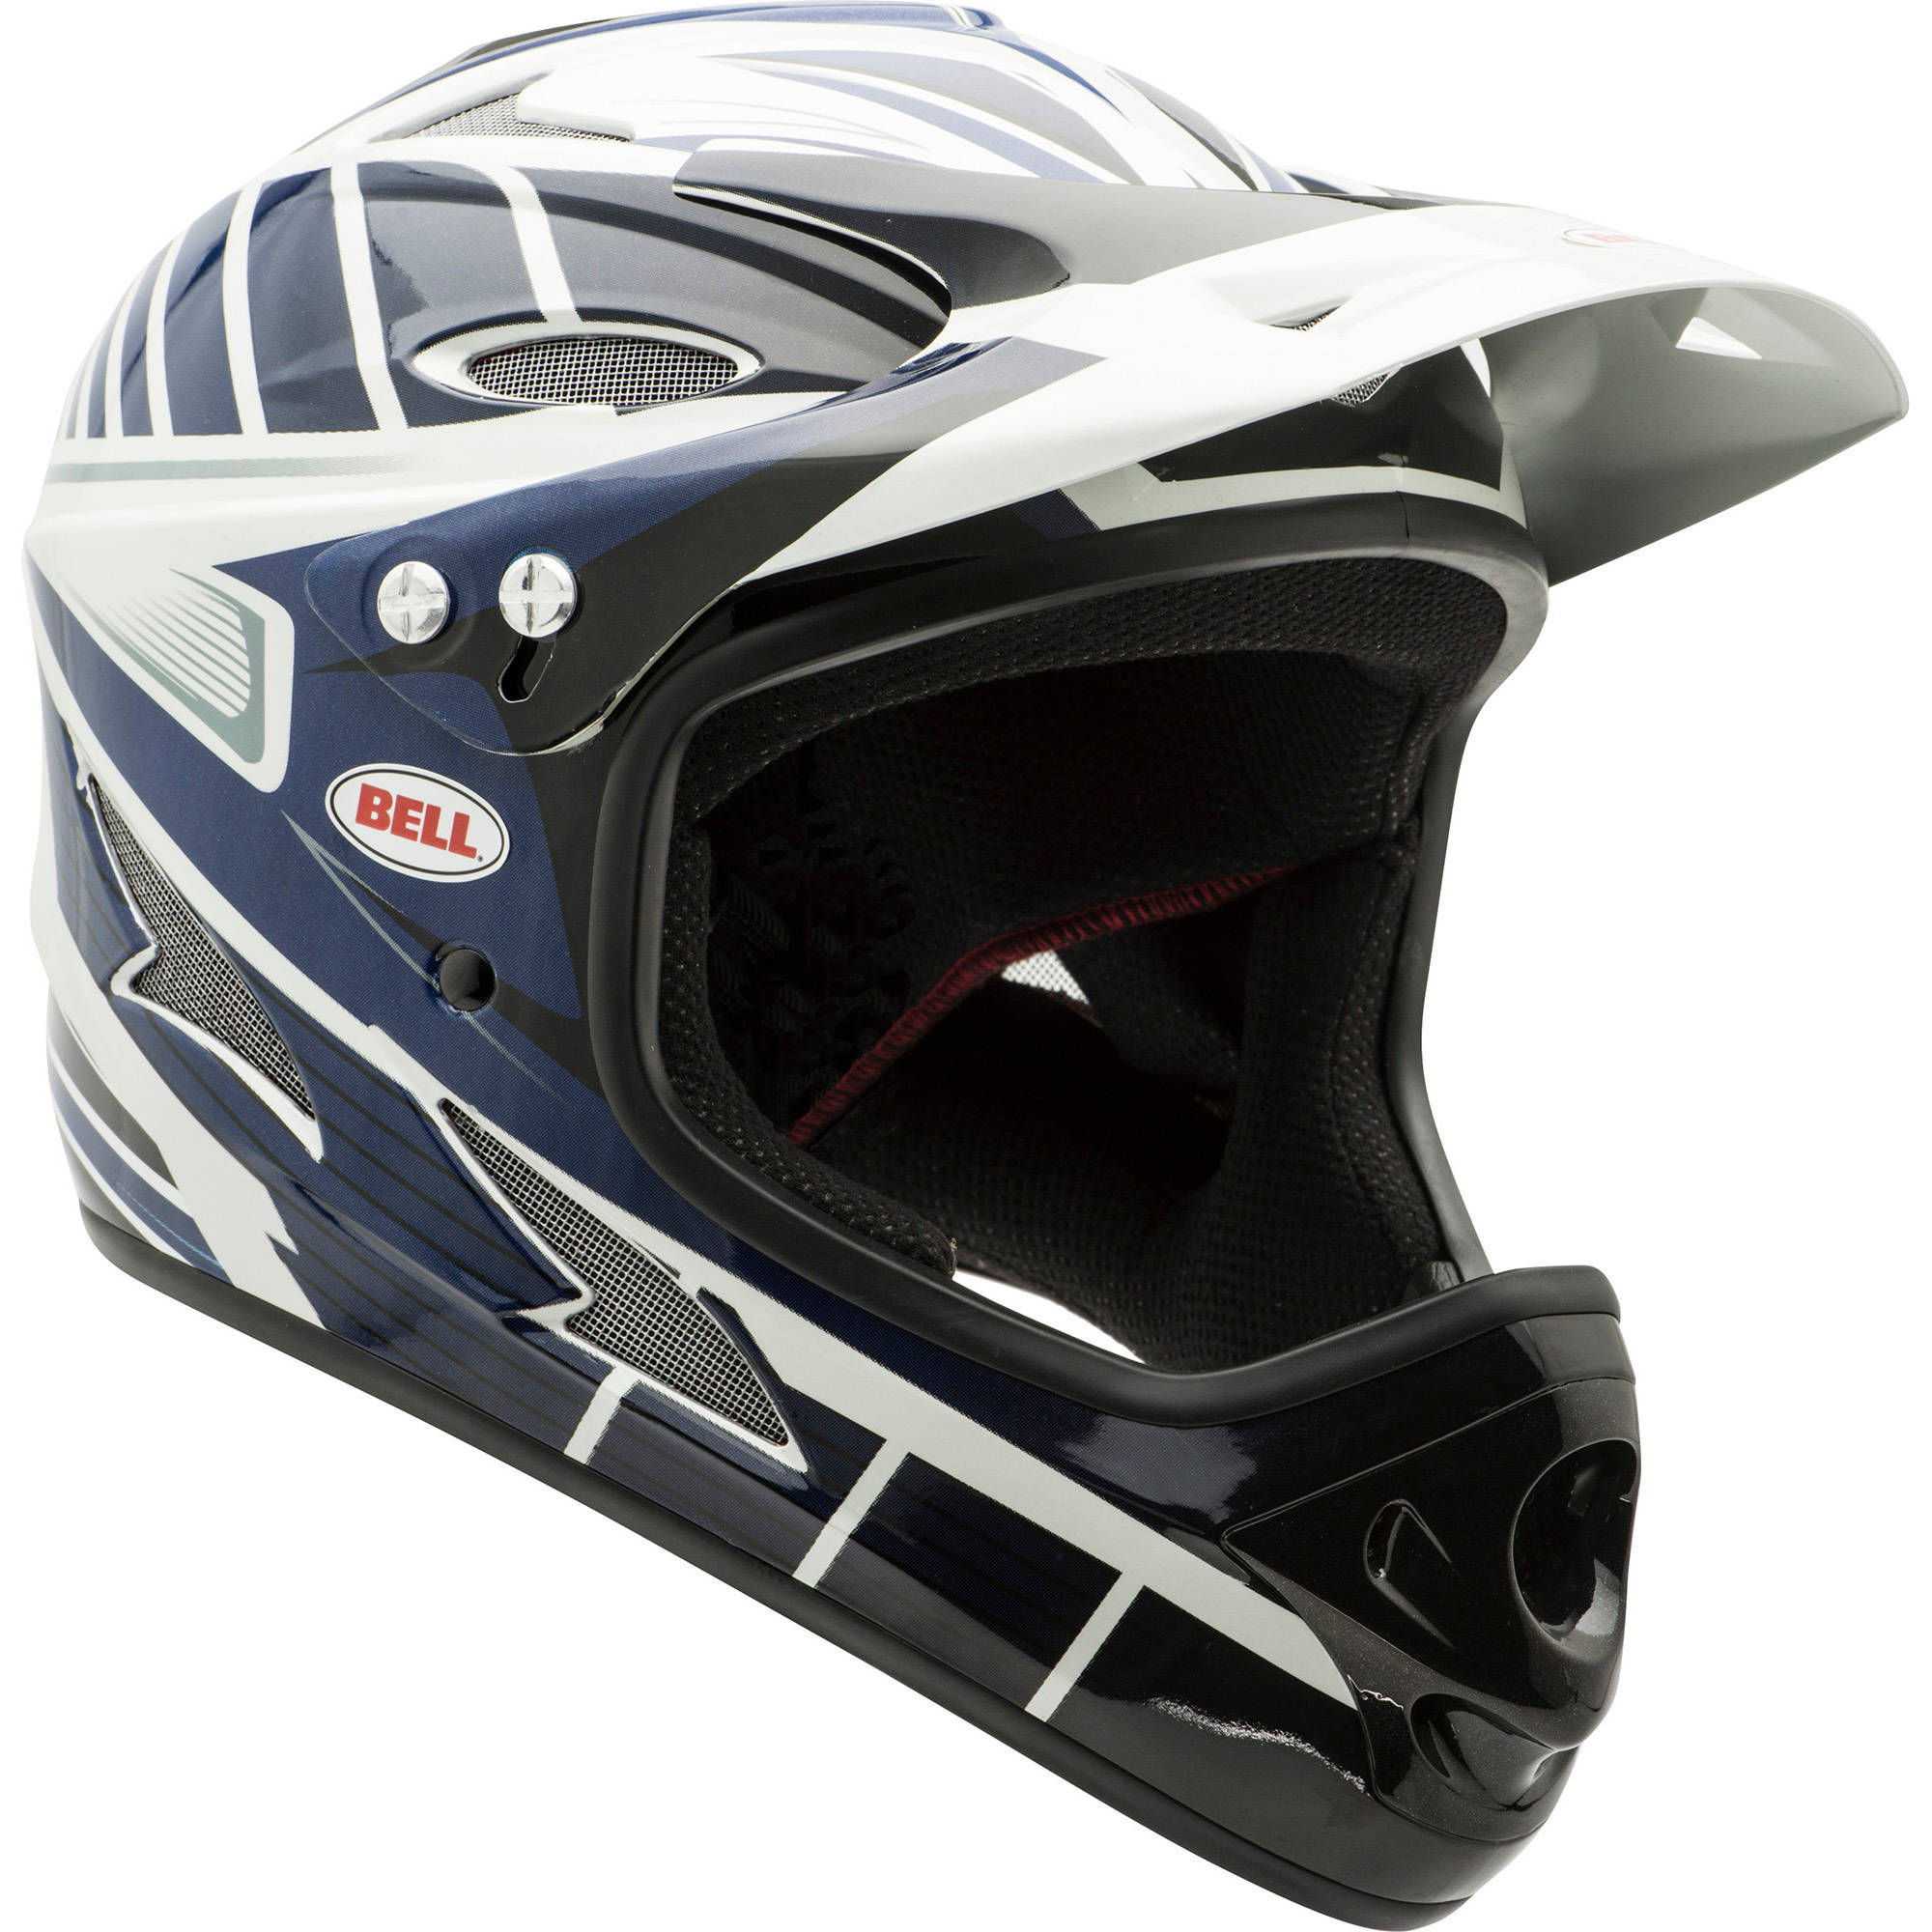 Bell Sports Exodus Youth Full-Face Bike Helmet w/ Chinbar, Black/White